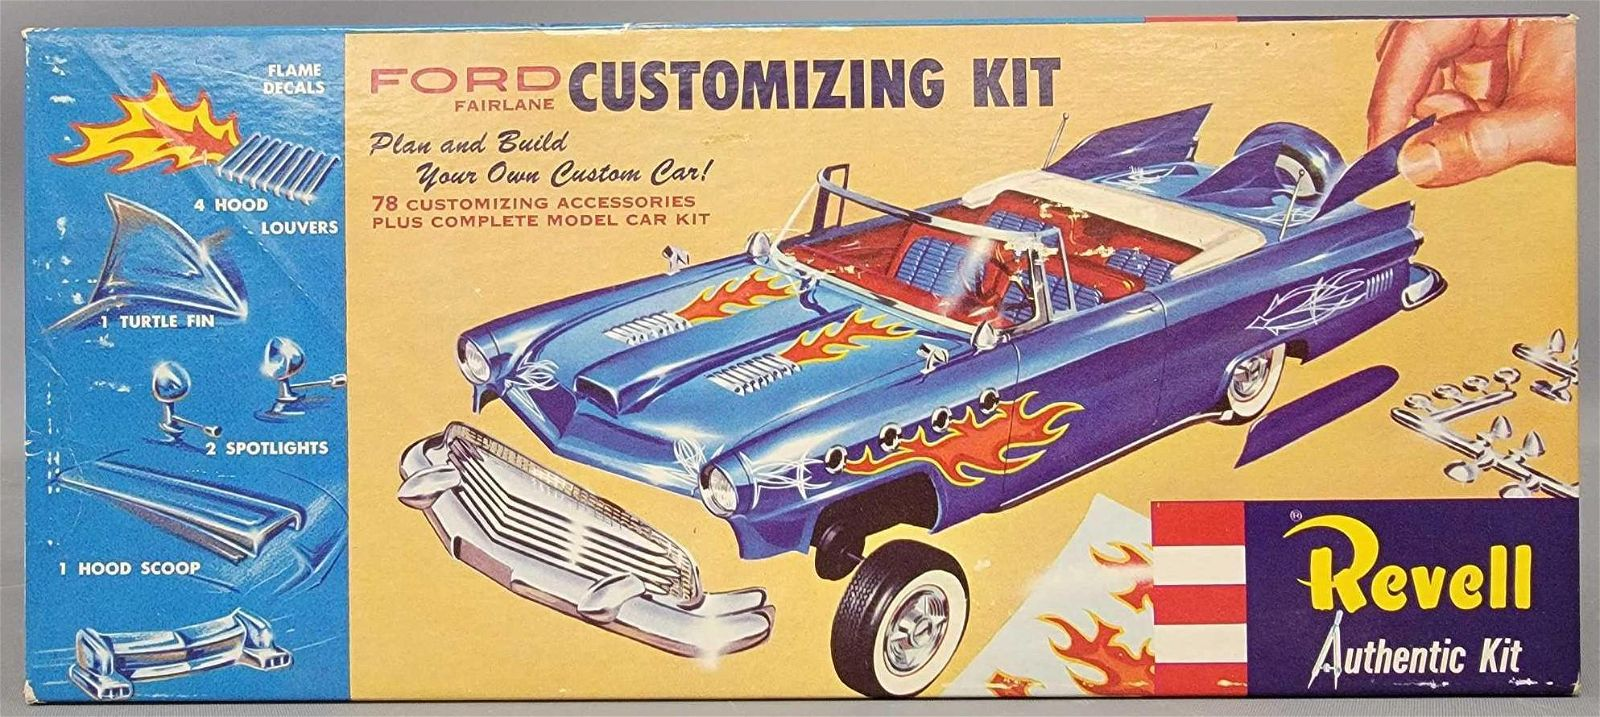 Revell Ford Fairlane Customizing kit 1:25 scale model